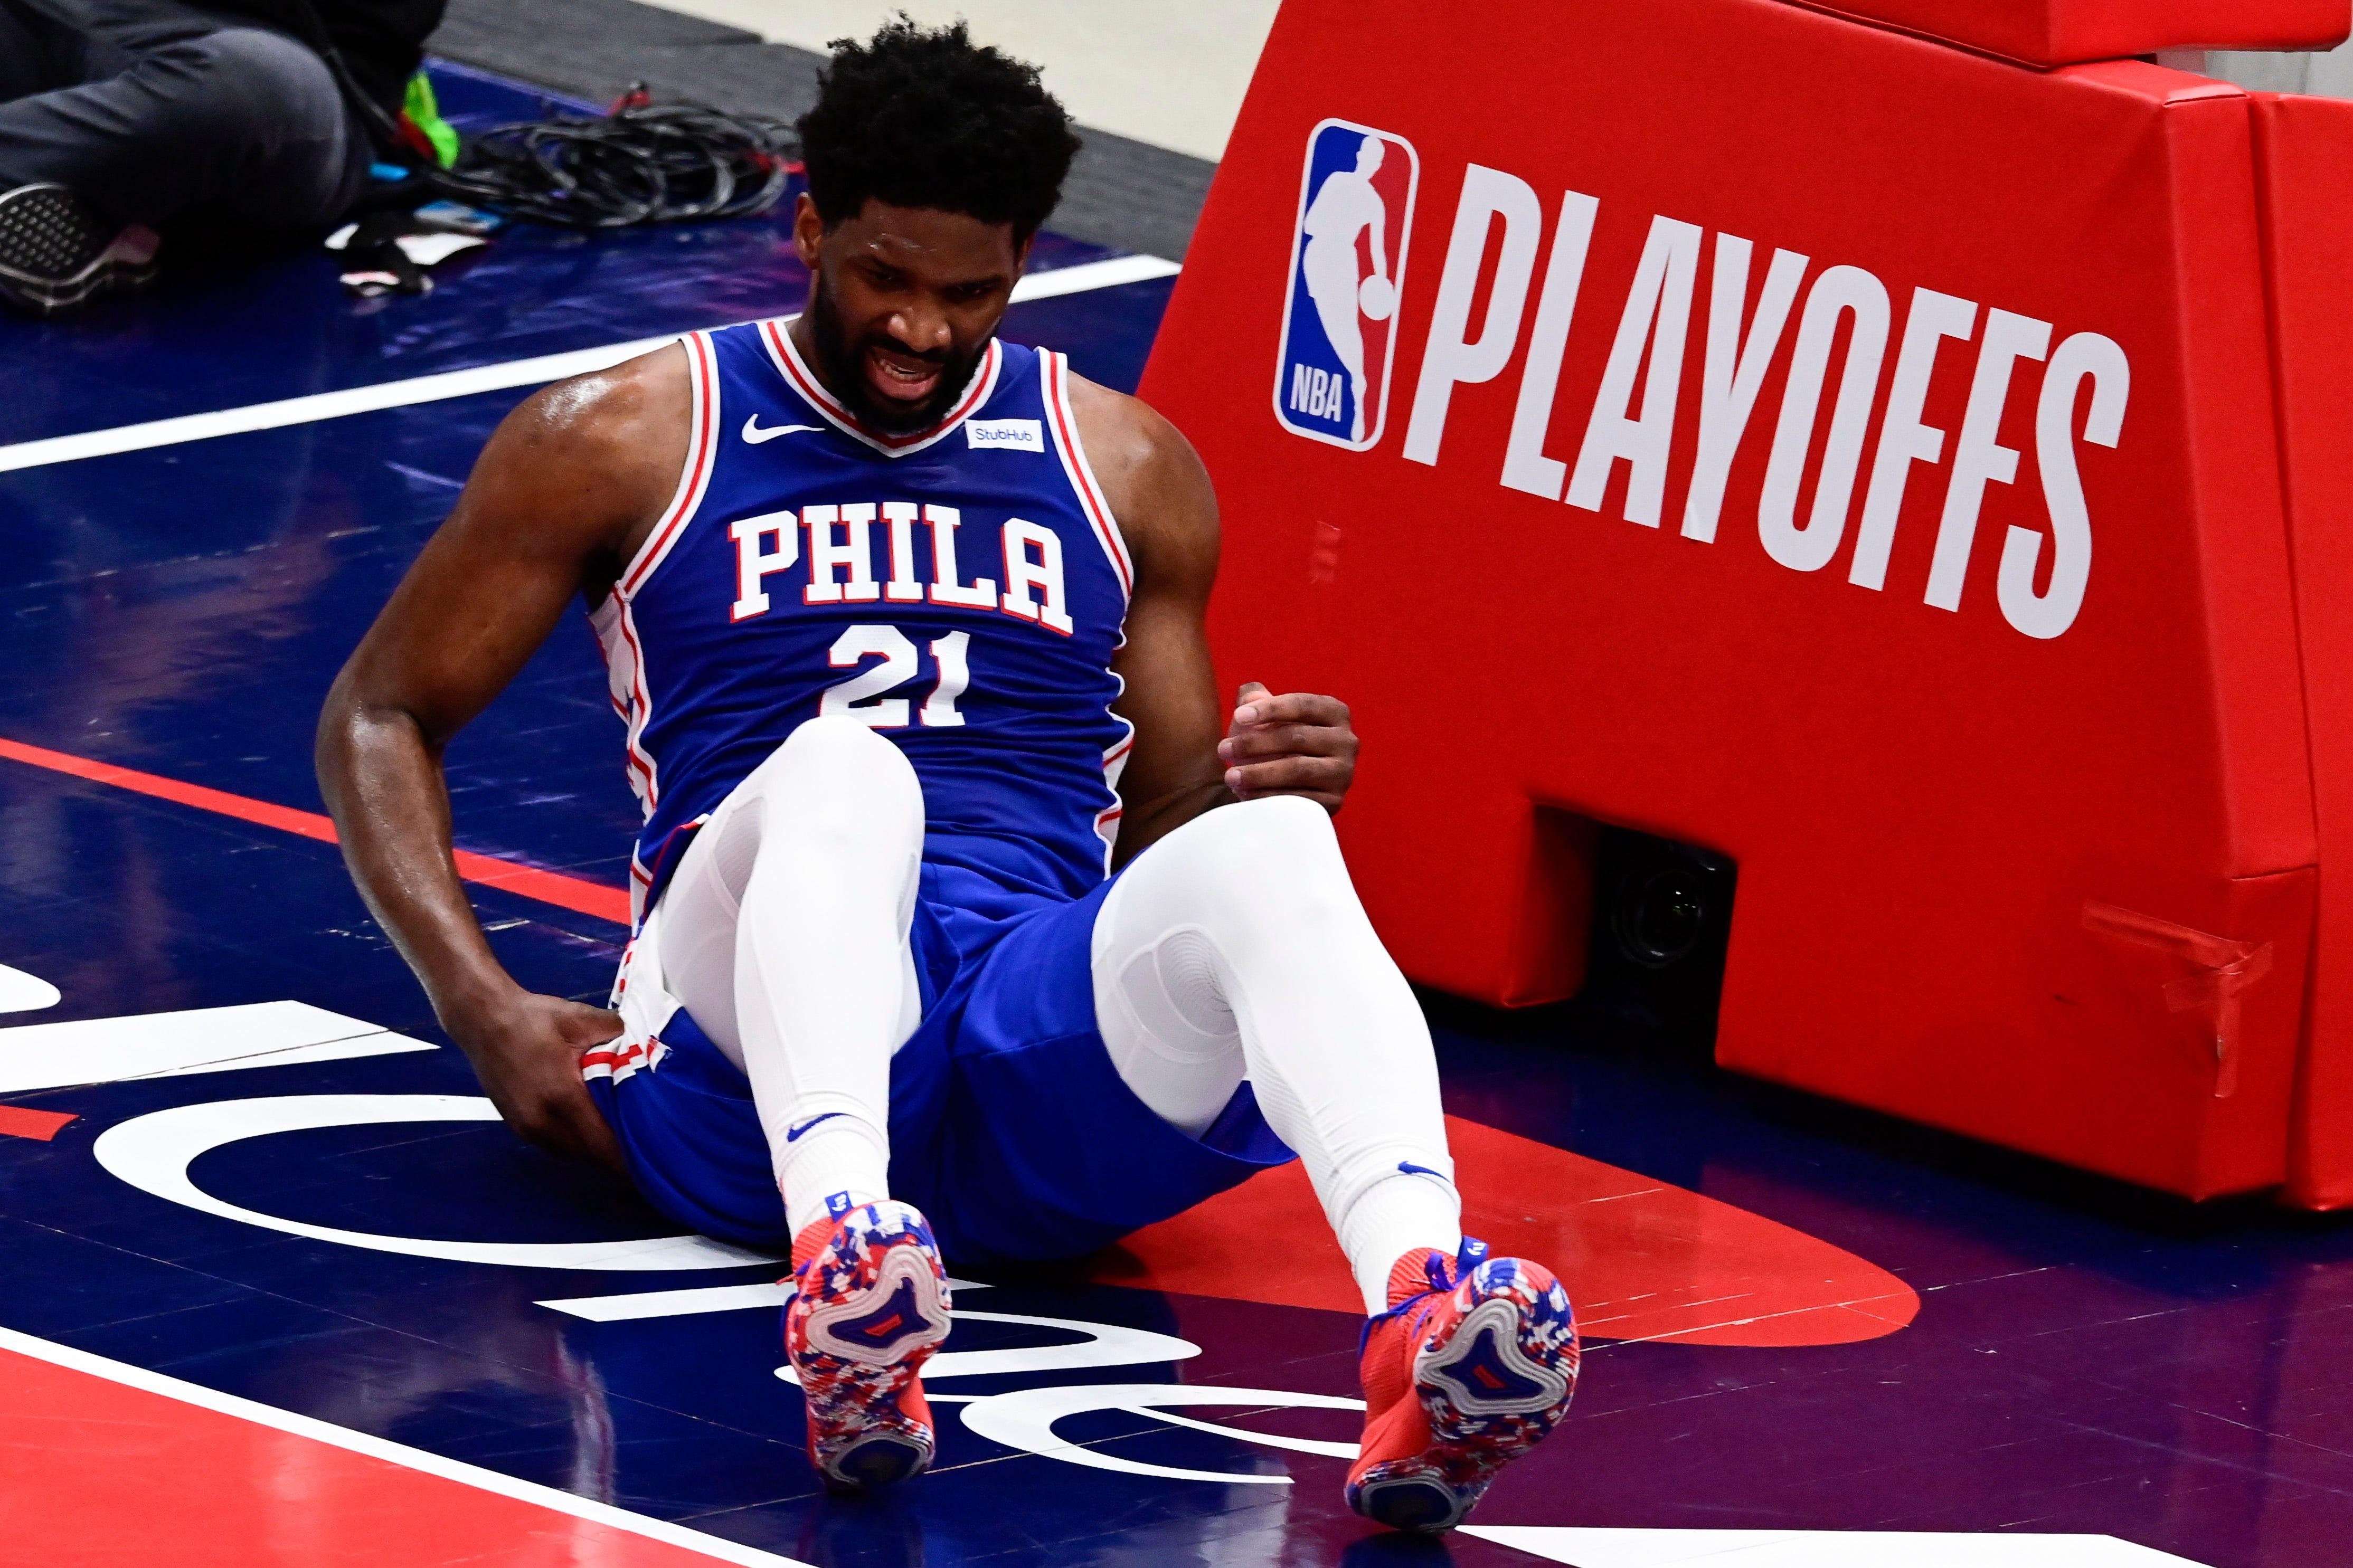 Joel Embiid doubtful for Philadelphia 76ers' NBA playoff Game 5 vs. Washington Wizards